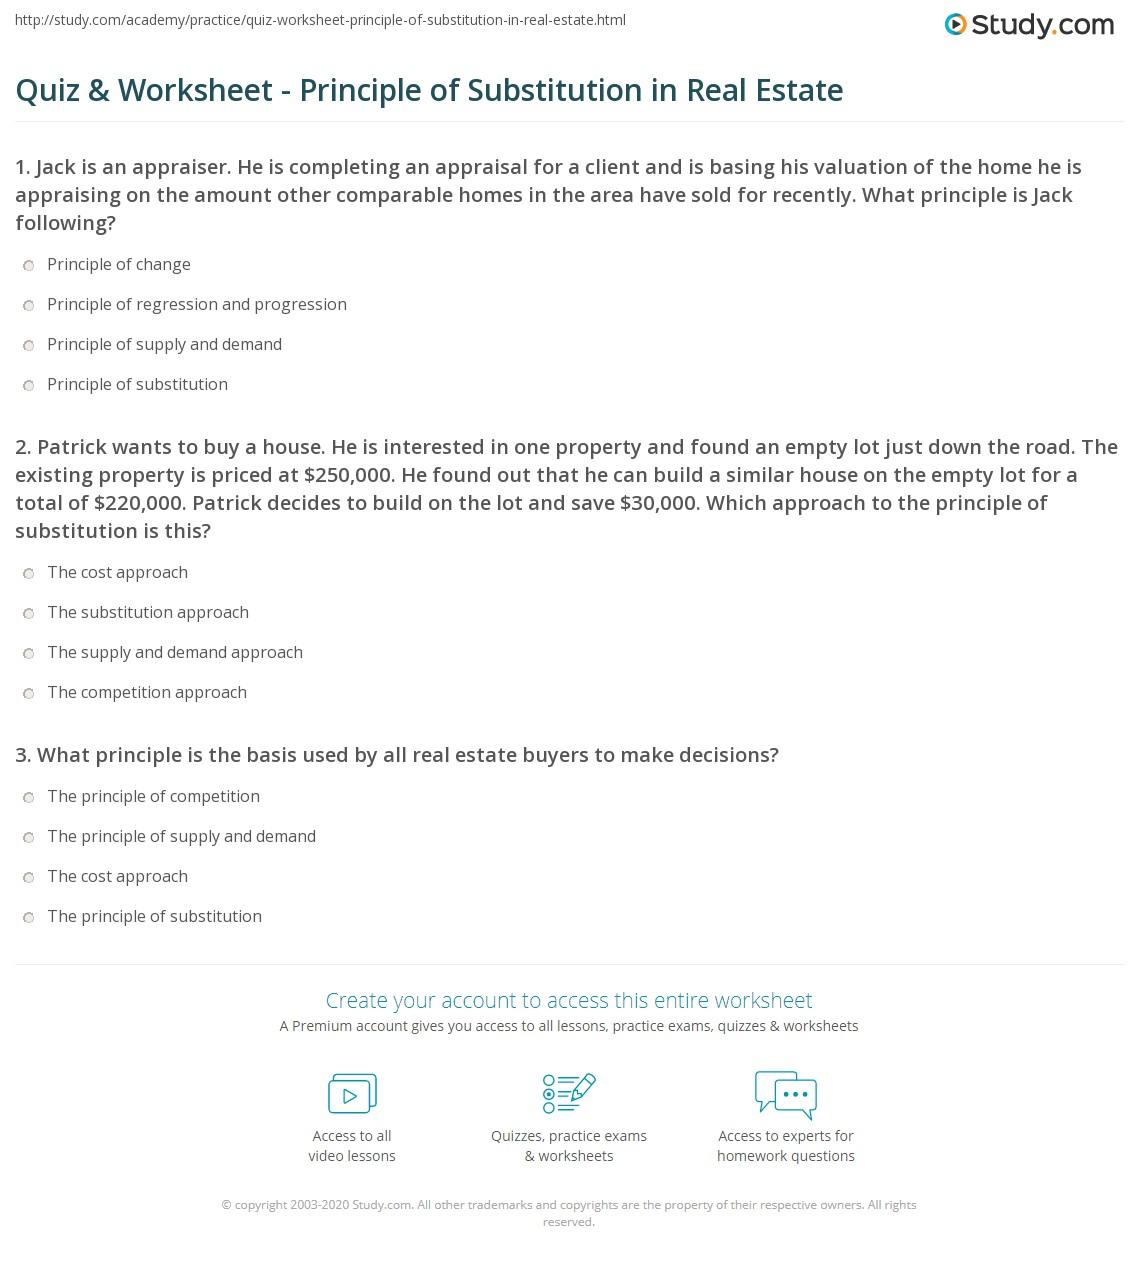 Quiz & Worksheet - Principle of Substitution in Real Estate | Study.com